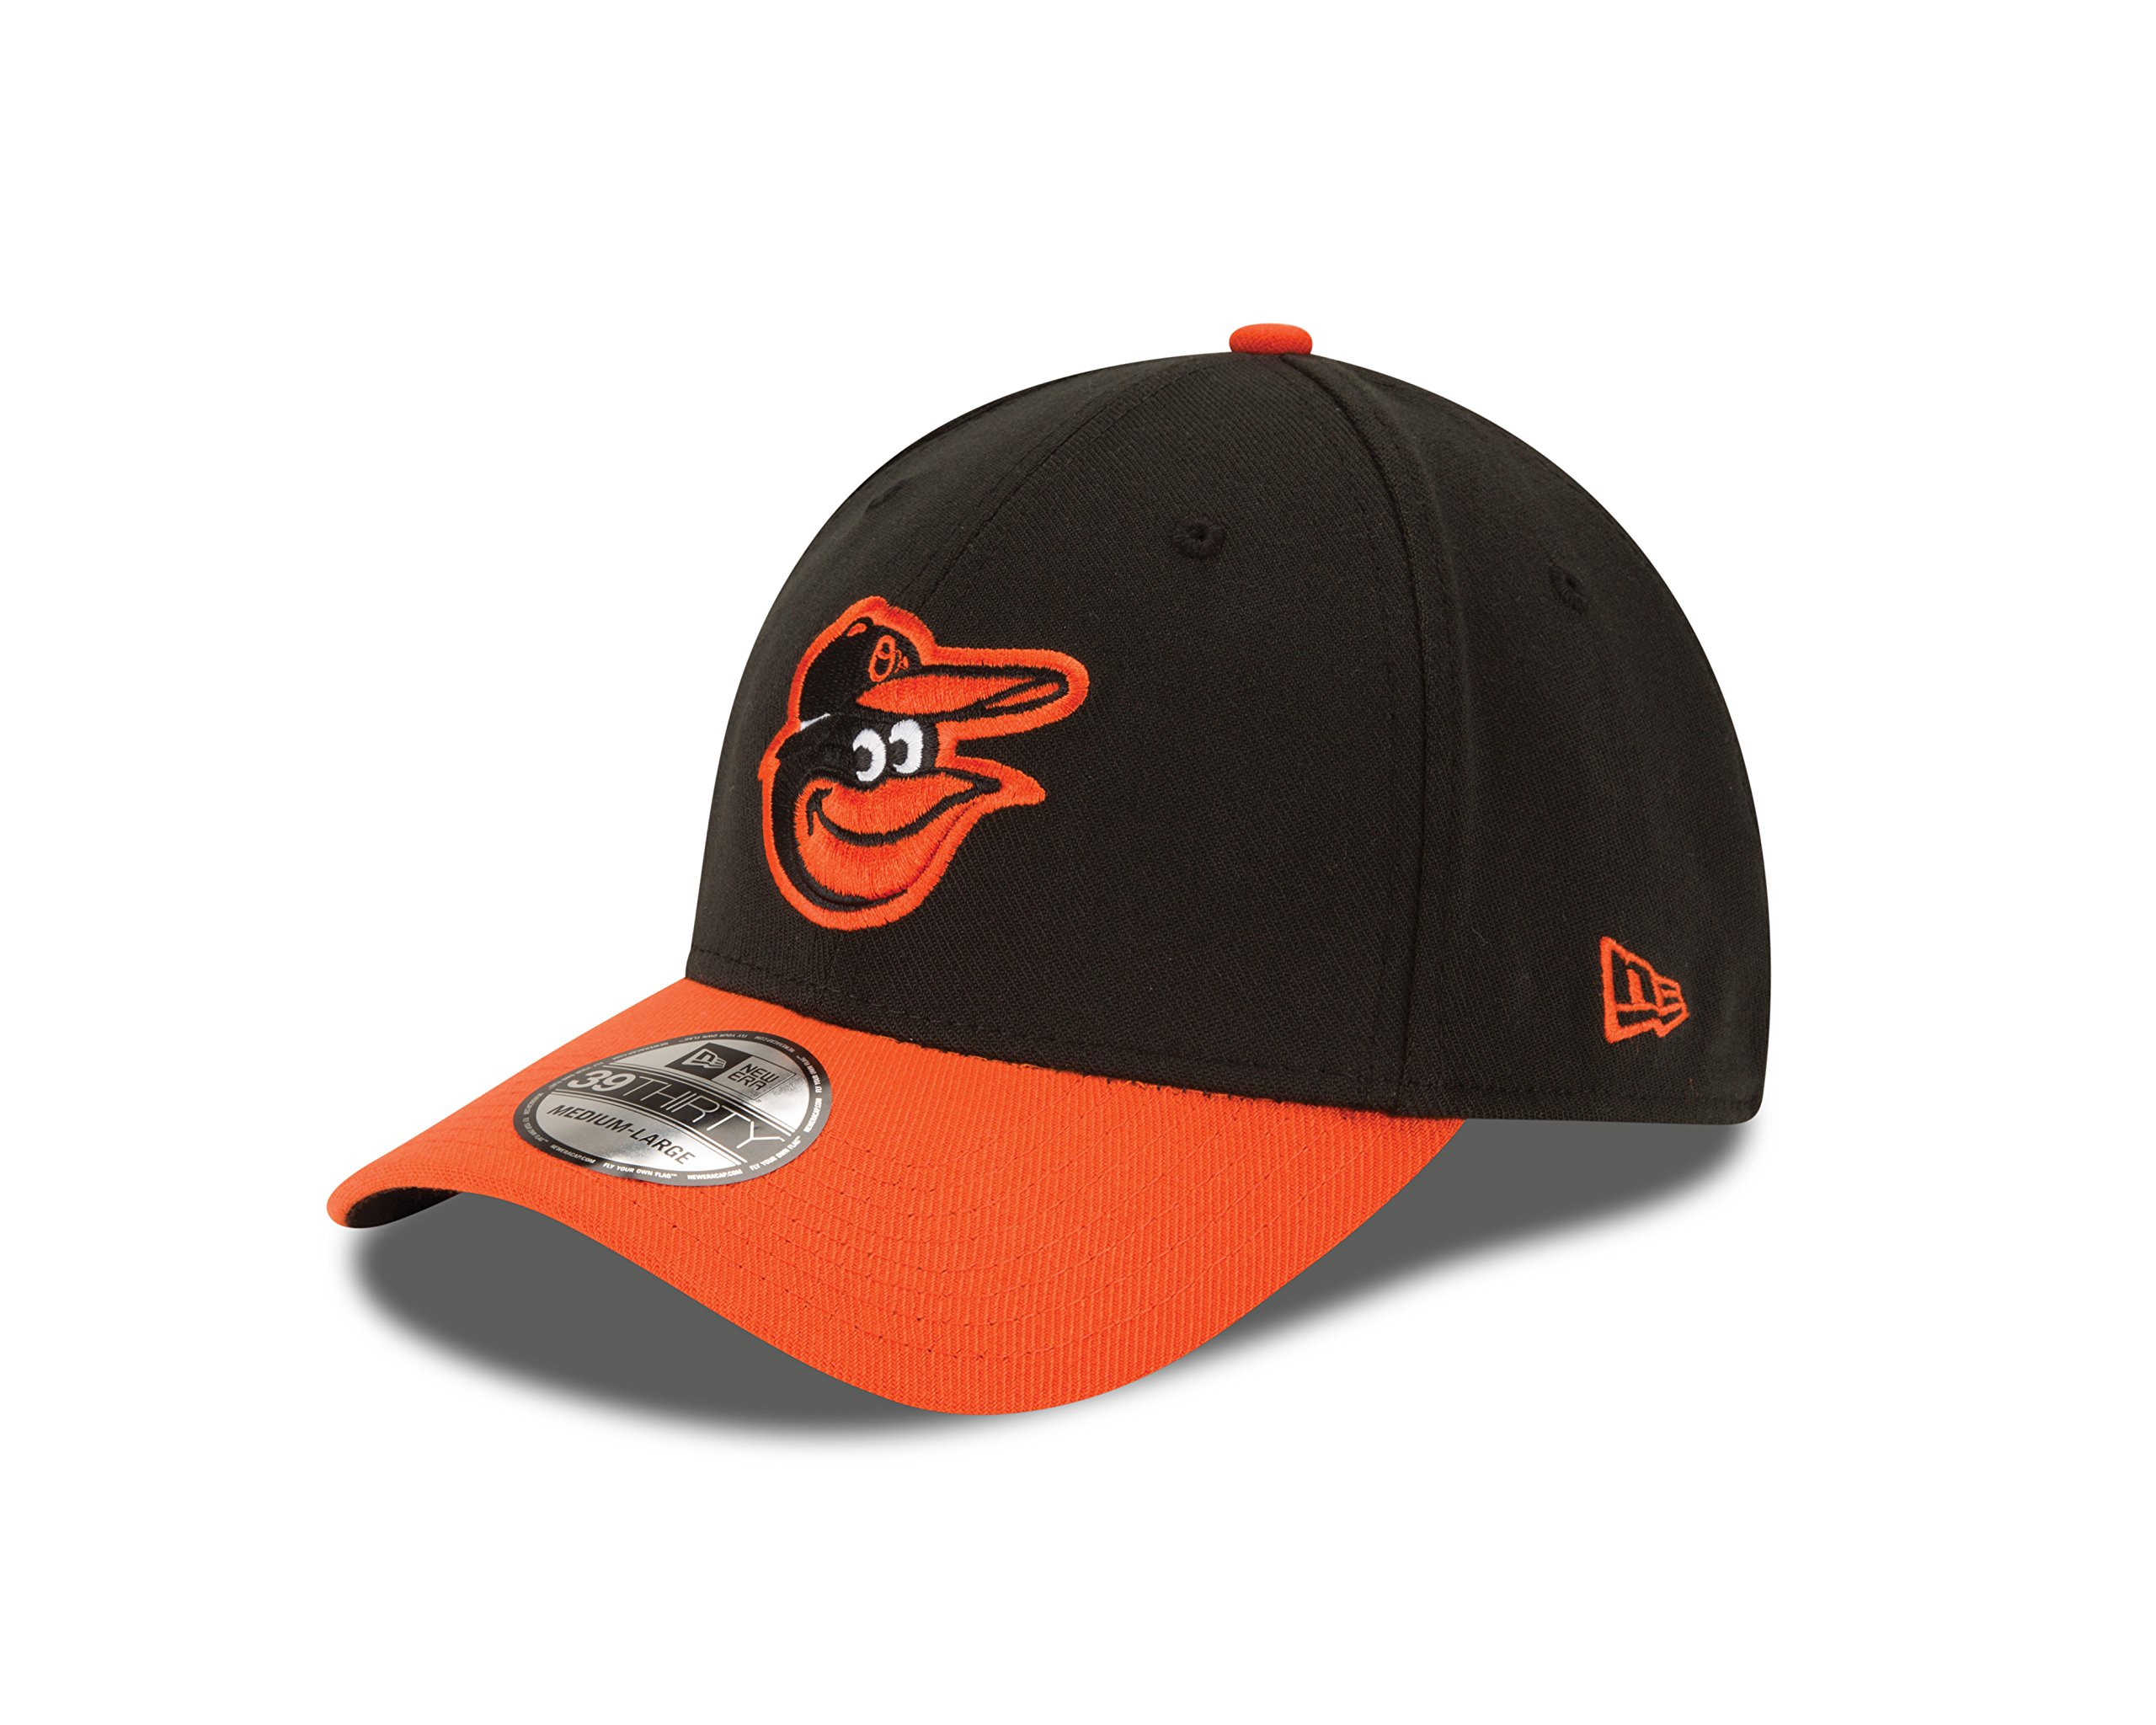 New Era MLB Baltimore Orioles Team Classic Road 39Thirty Stretch Fit Cap, Black, Small/Medium